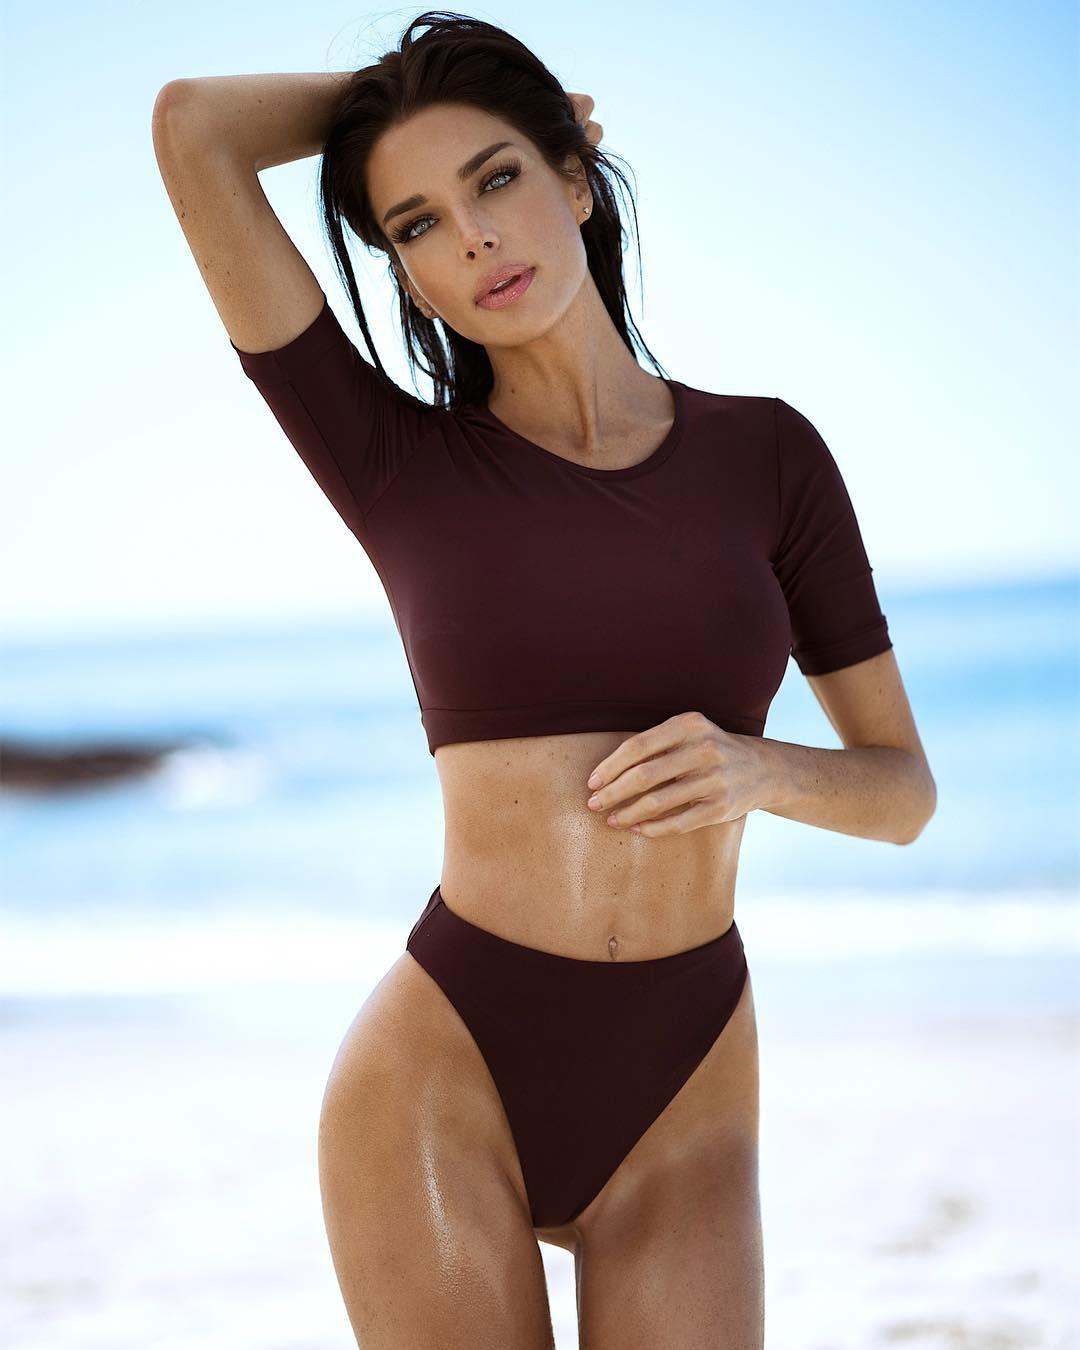 Patience Silva bikini swimwear dress for girls, photoshoot ideas